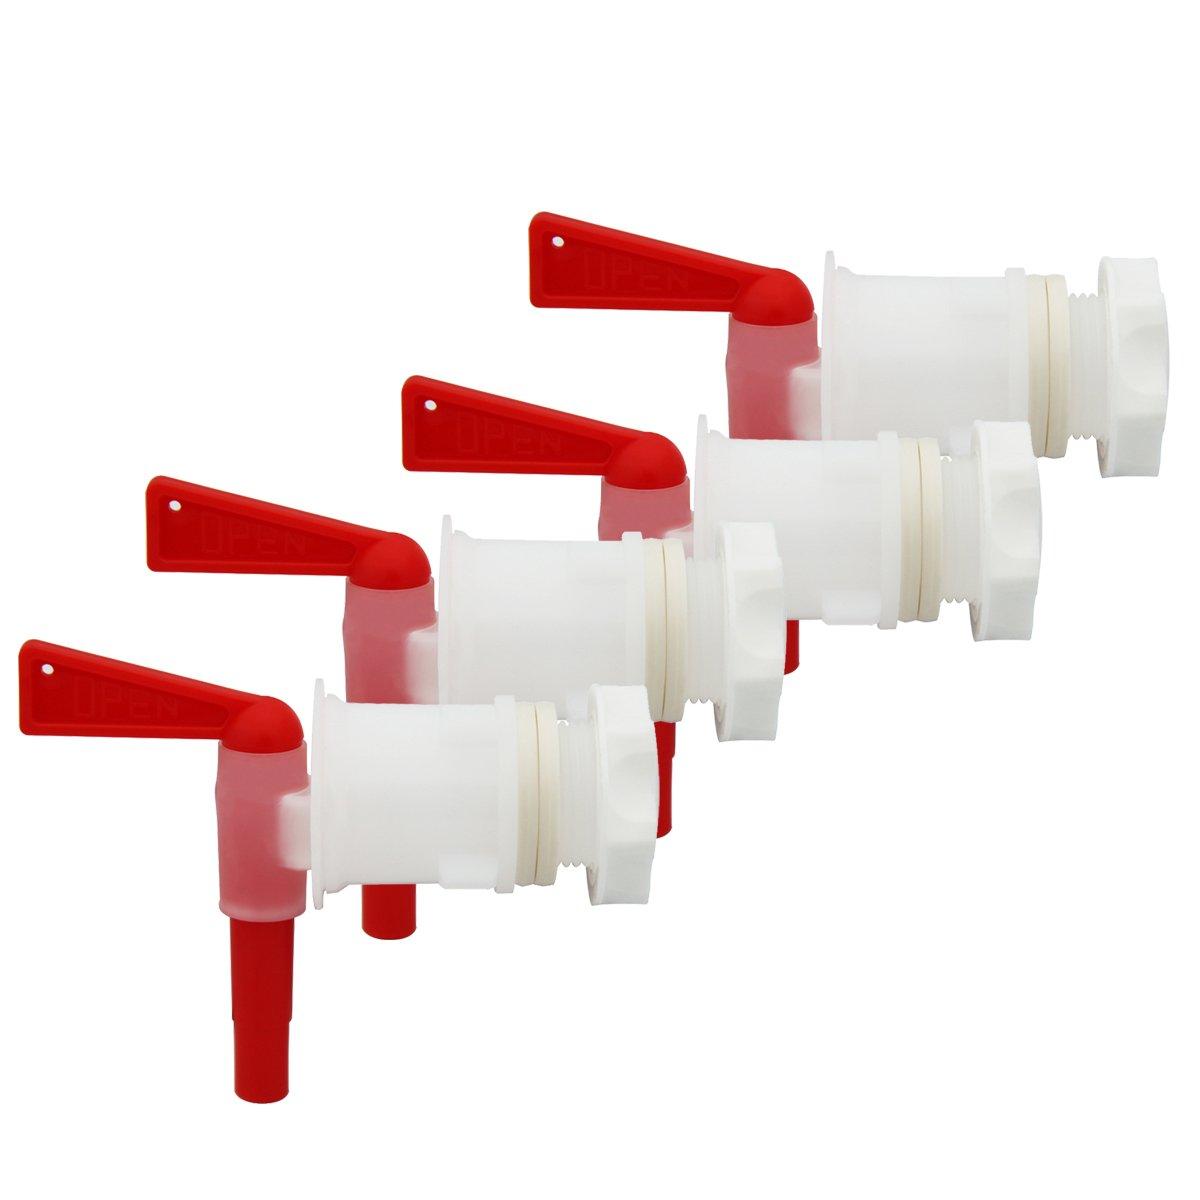 PERA 4 PACK Plastic Bottling Bucket keg Spigot tap faucet for Homebrew Wine Making Beer